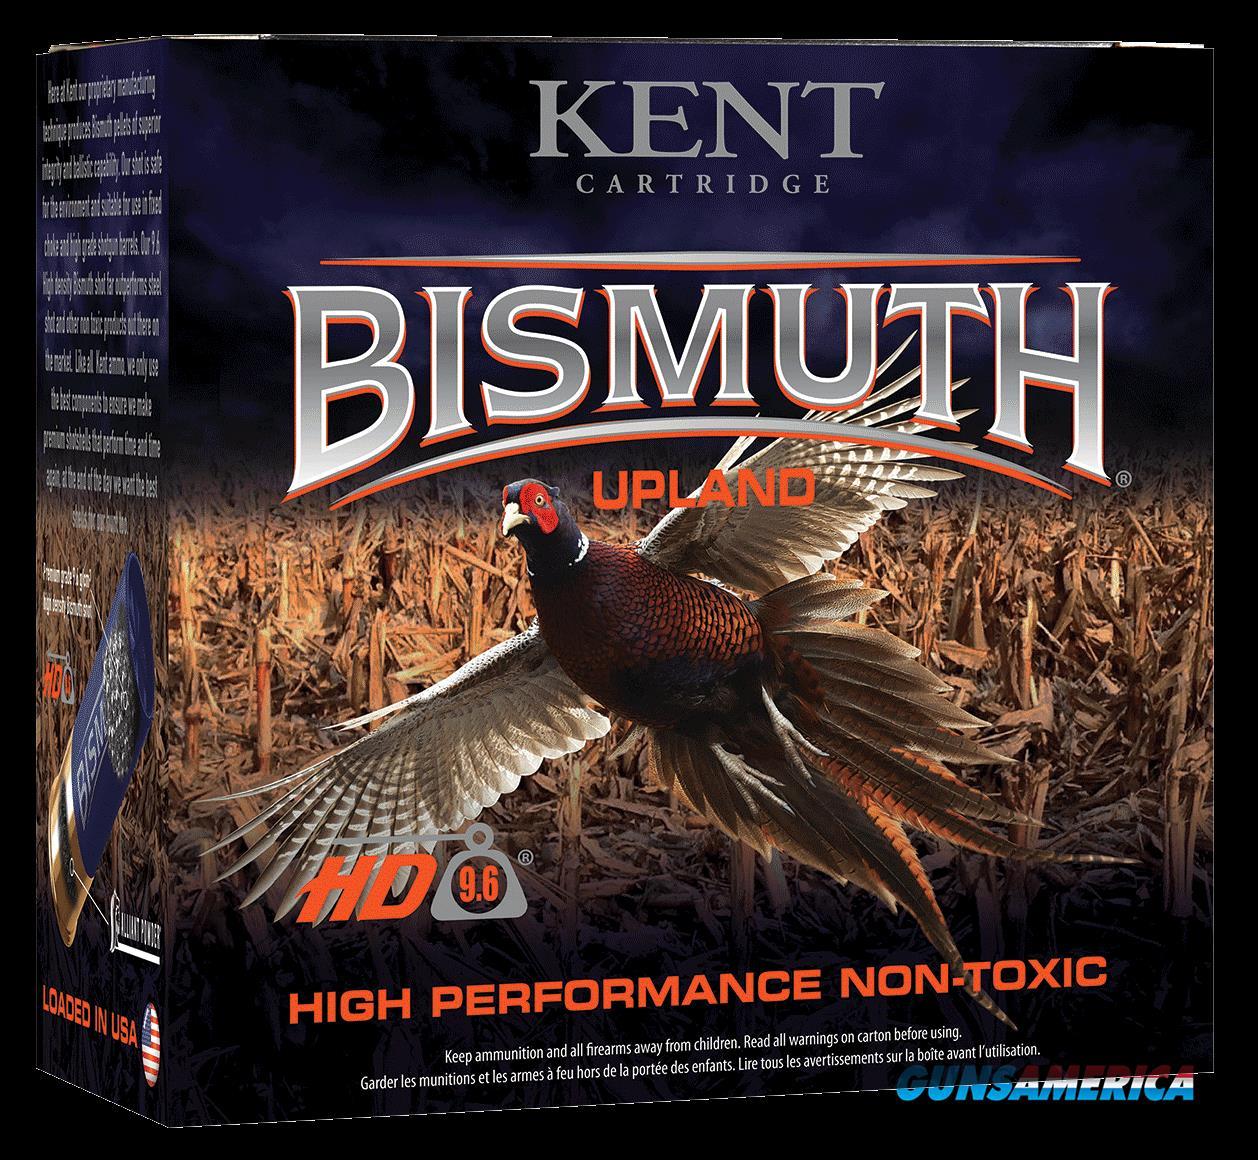 Kent Cartridge Bismuth, Kent B12u365    2.75  11-4 Bismt Upland      25-10  Guns > Pistols > 1911 Pistol Copies (non-Colt)